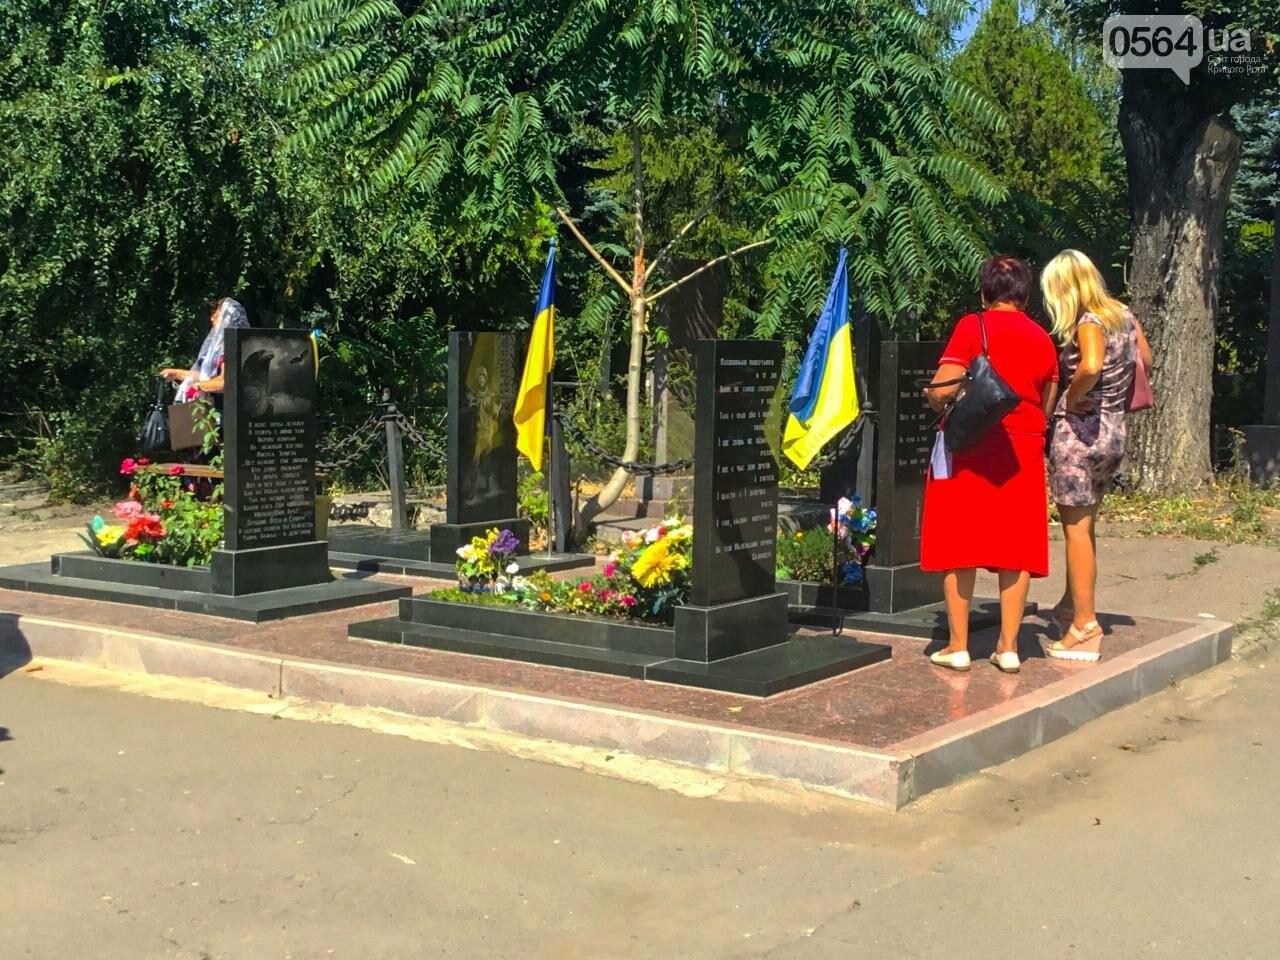 На Аллее Героев провели панихиду по погибшим в зоне АТО криворожанам, - ФОТО , фото-11